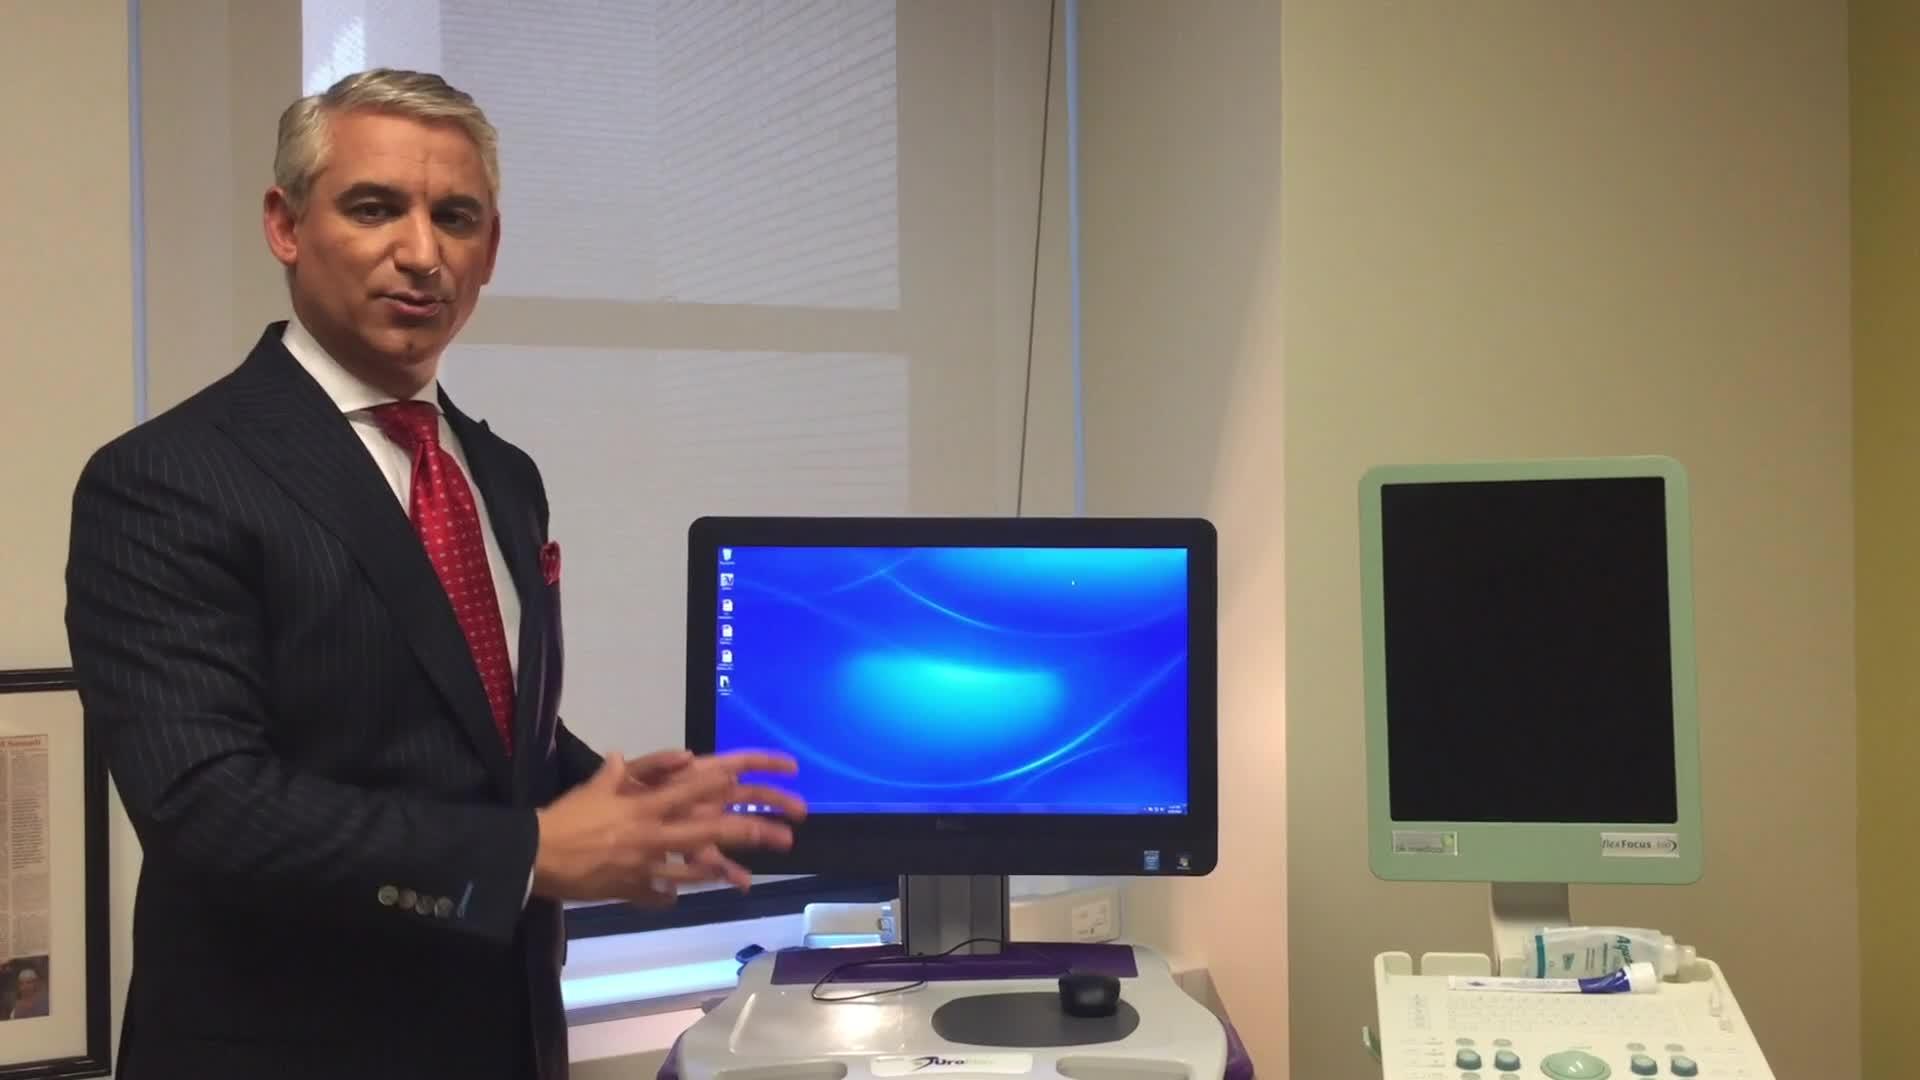 MRI Fusion Prostate Biopsy